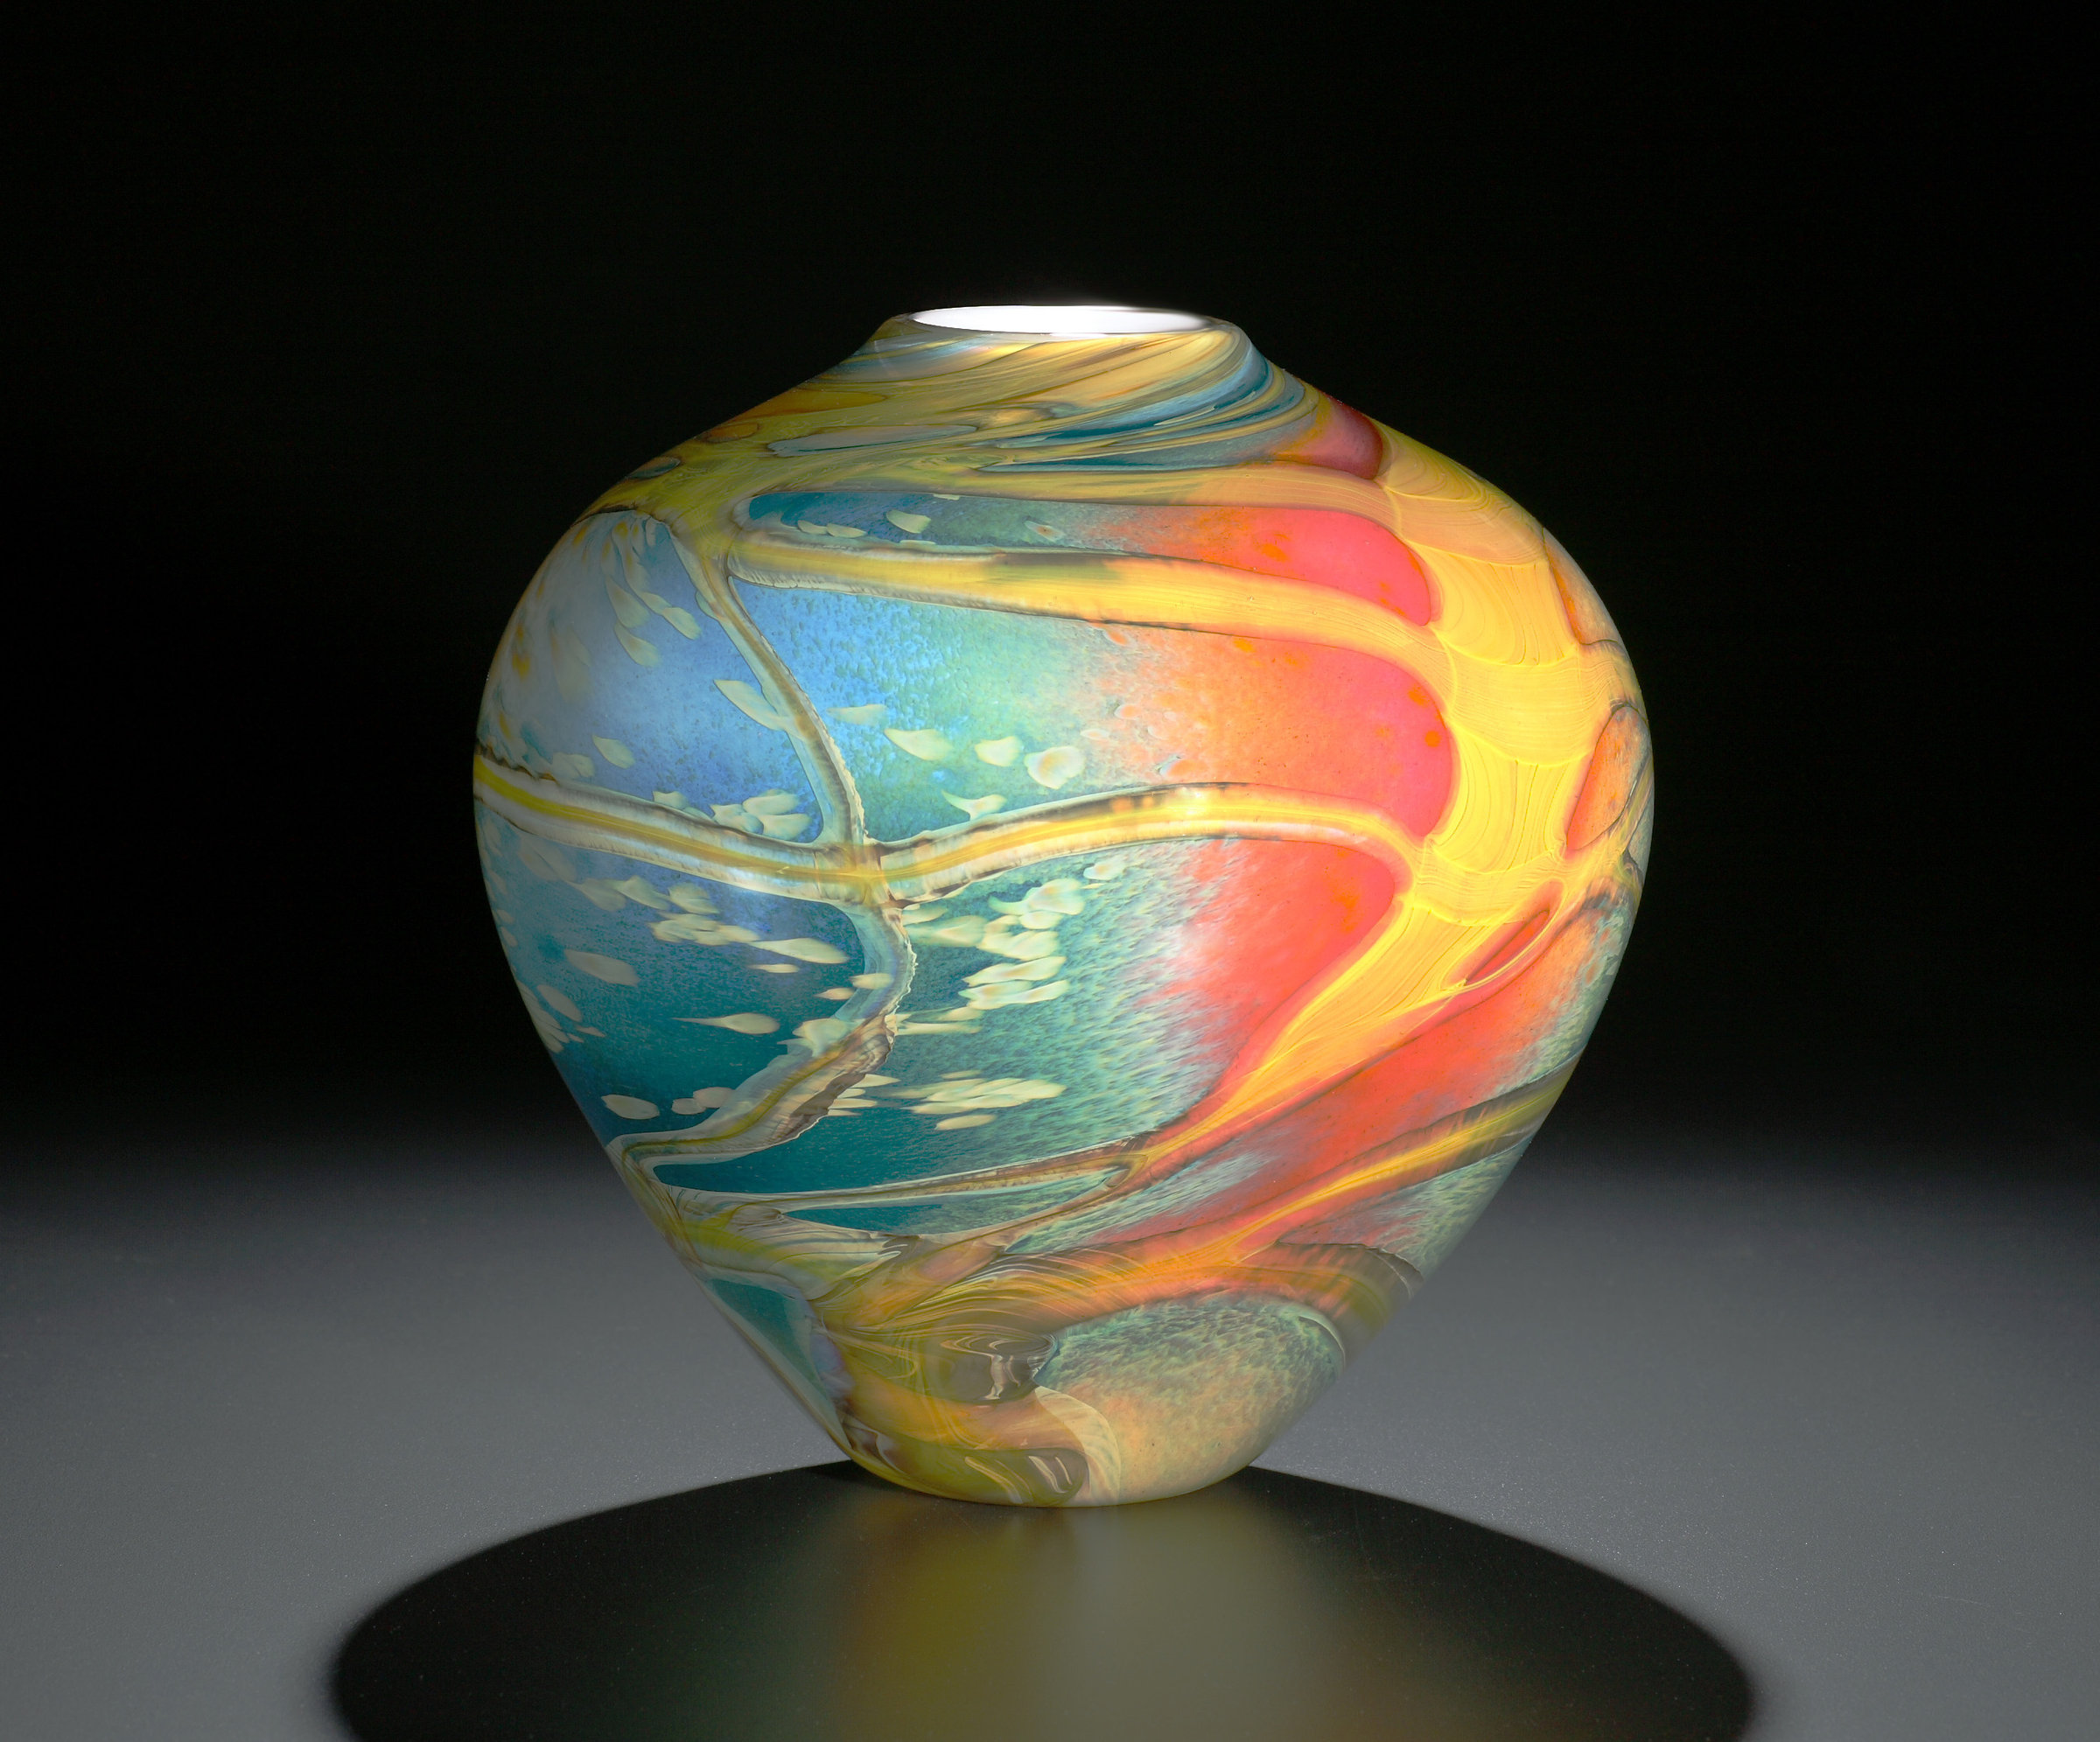 Cosmos Vase By John Amp Heather Fields Art Glass Vase